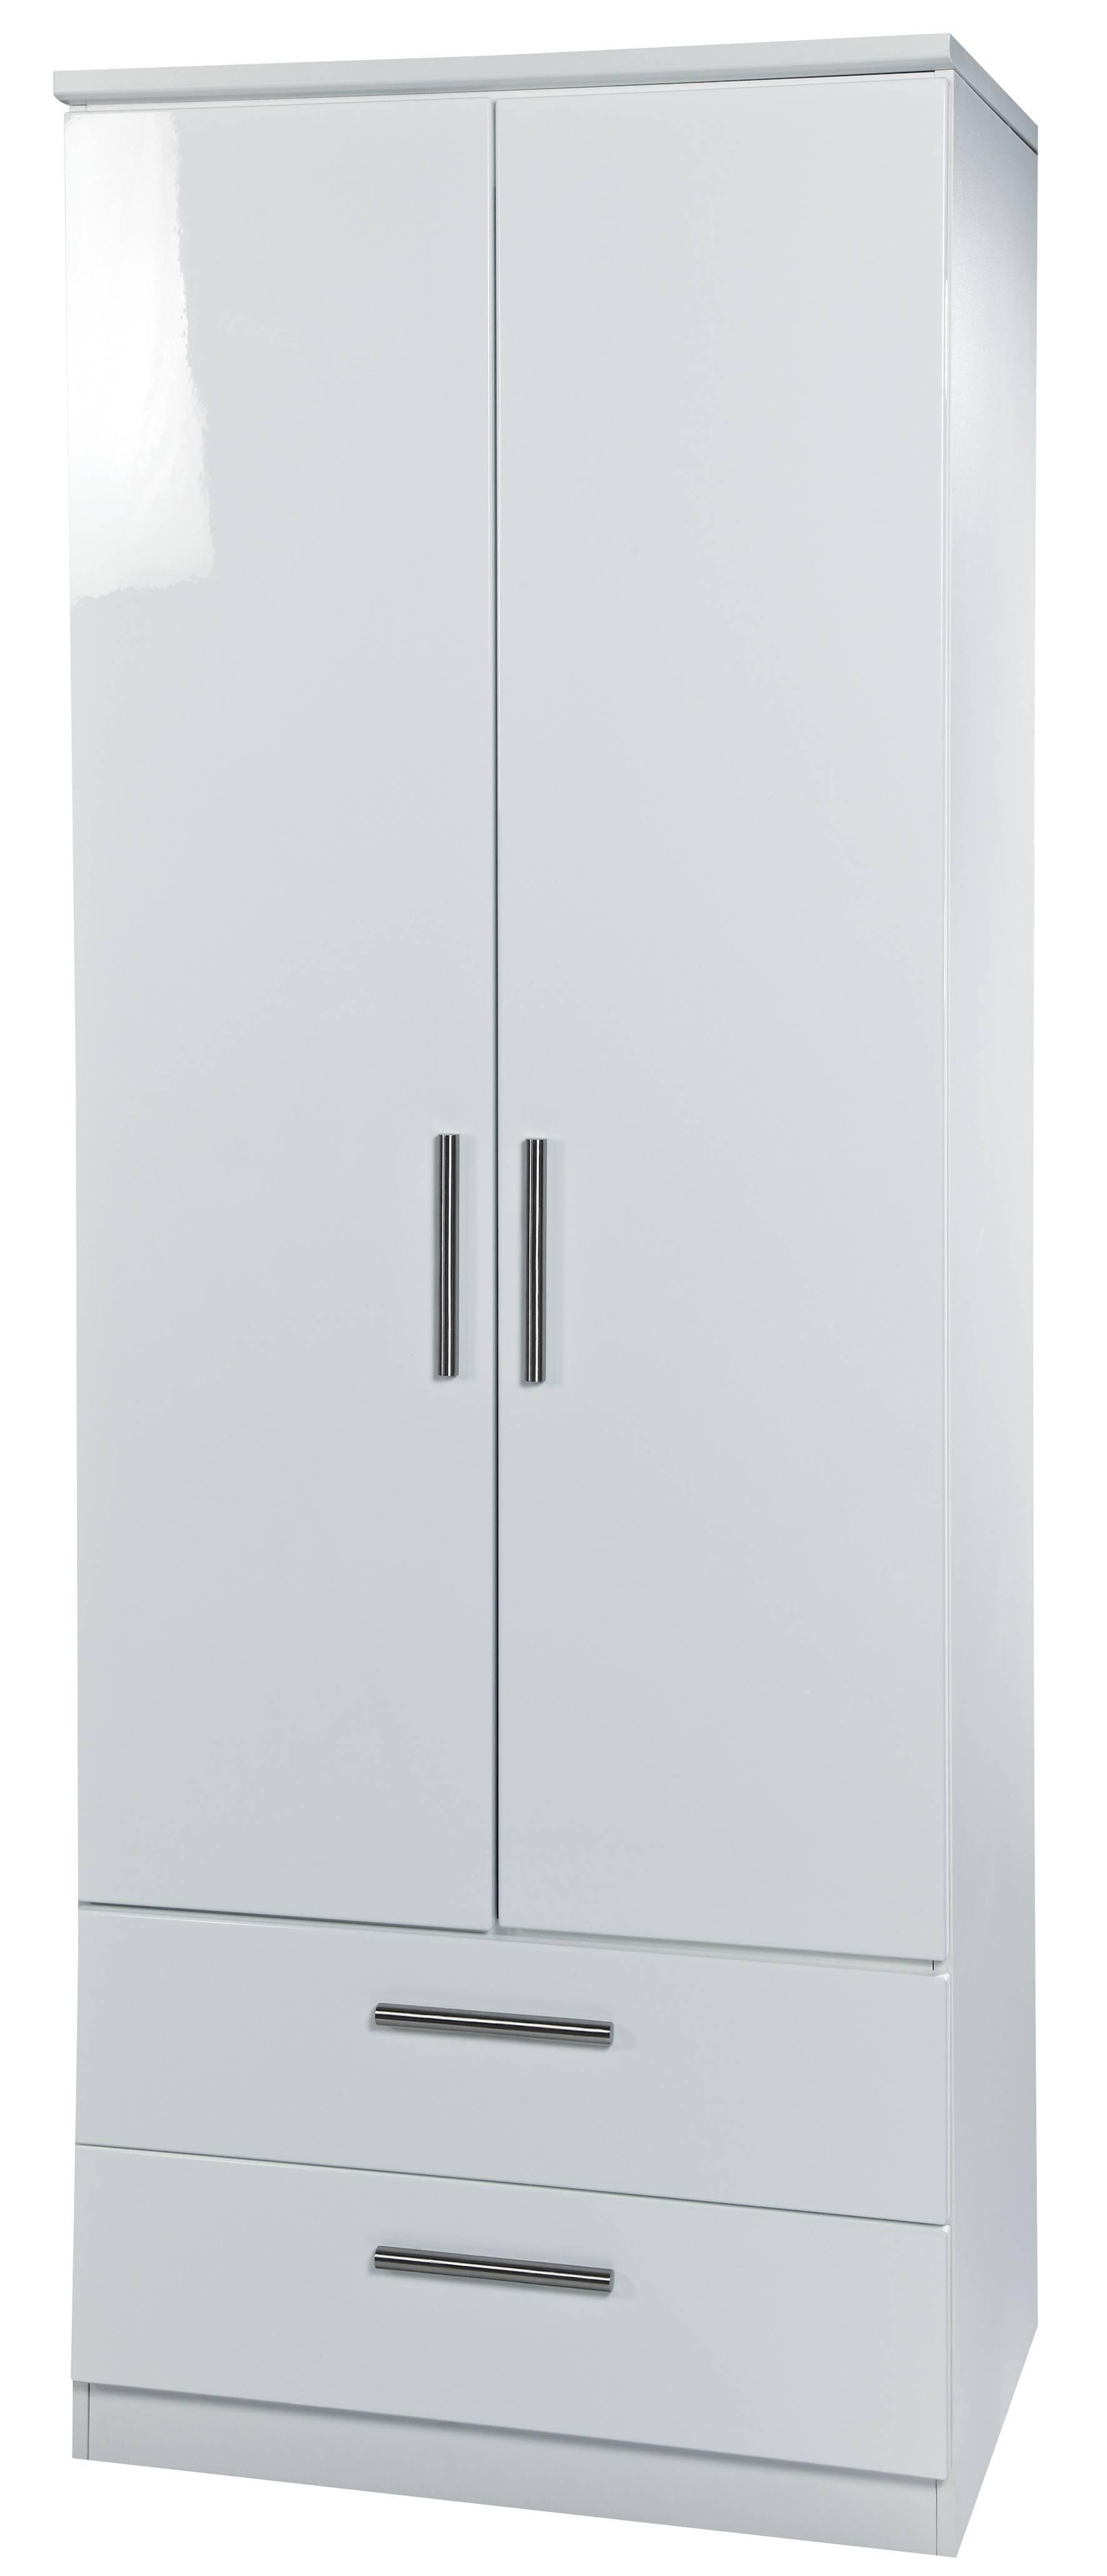 White High Gloss 2'6 2 Drawer Wardrobe throughout High Gloss White Wardrobes (Image 14 of 15)